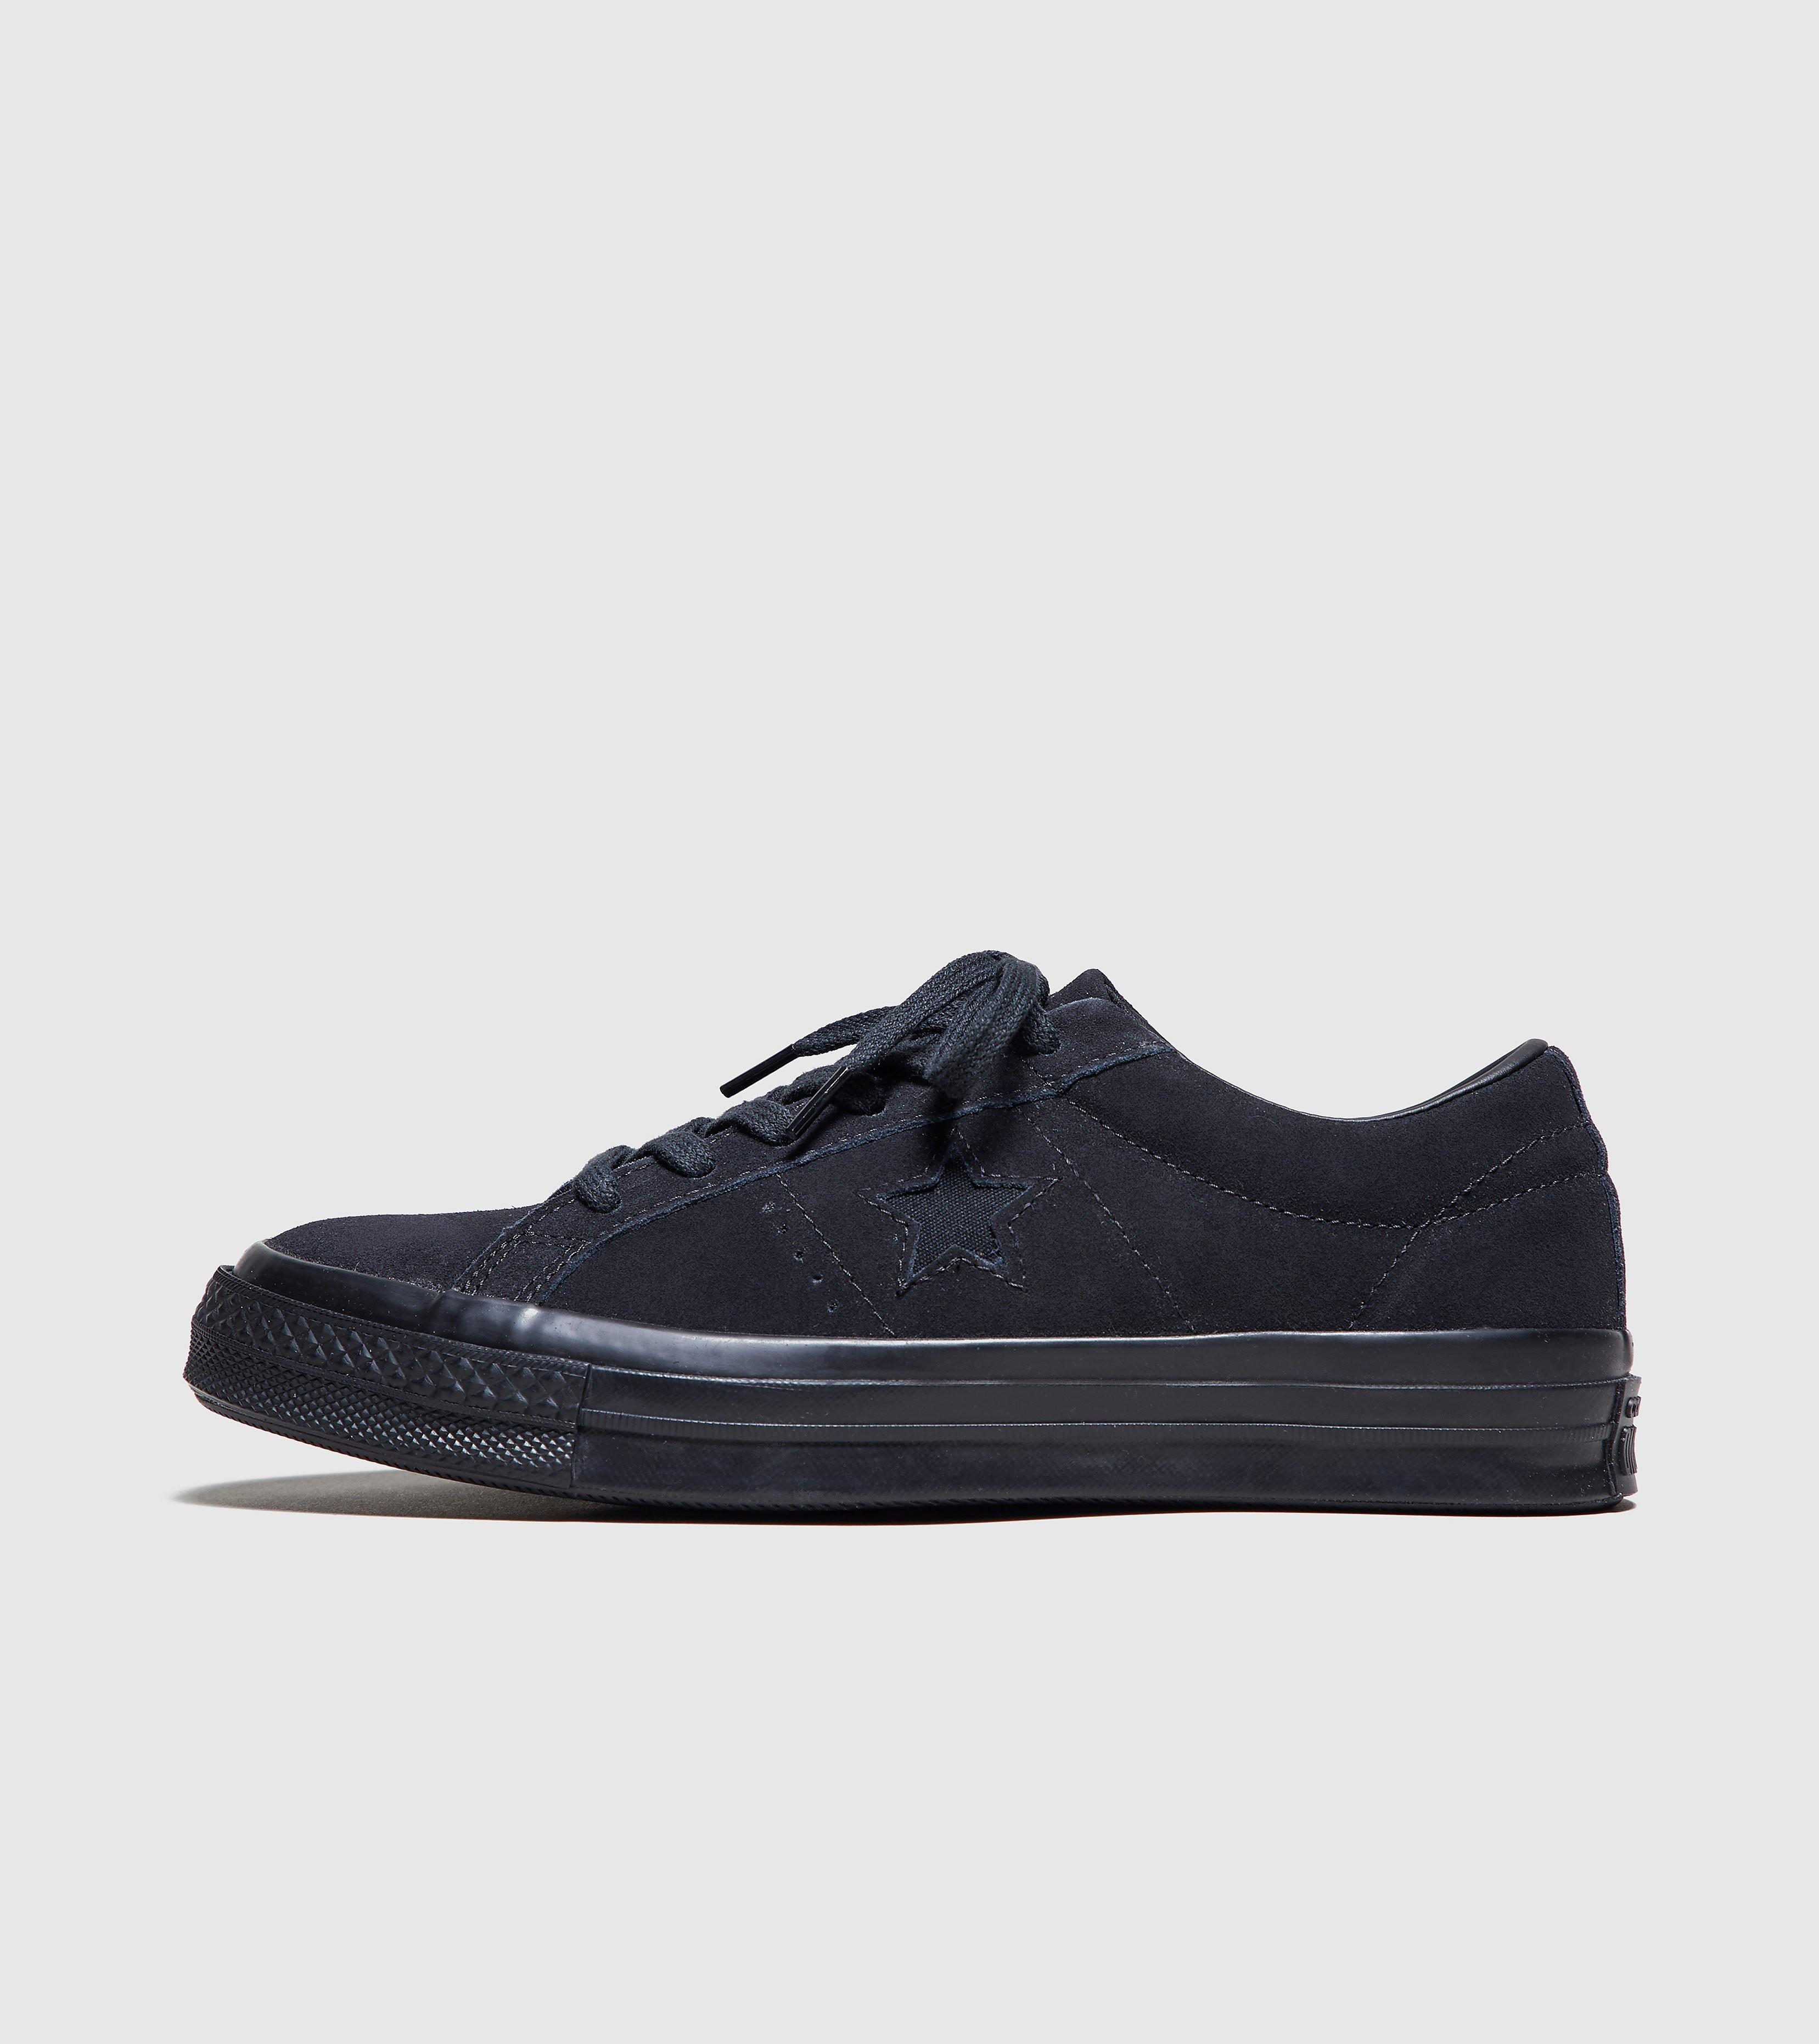 Sneaker Converse Converse One Star Ox Women's